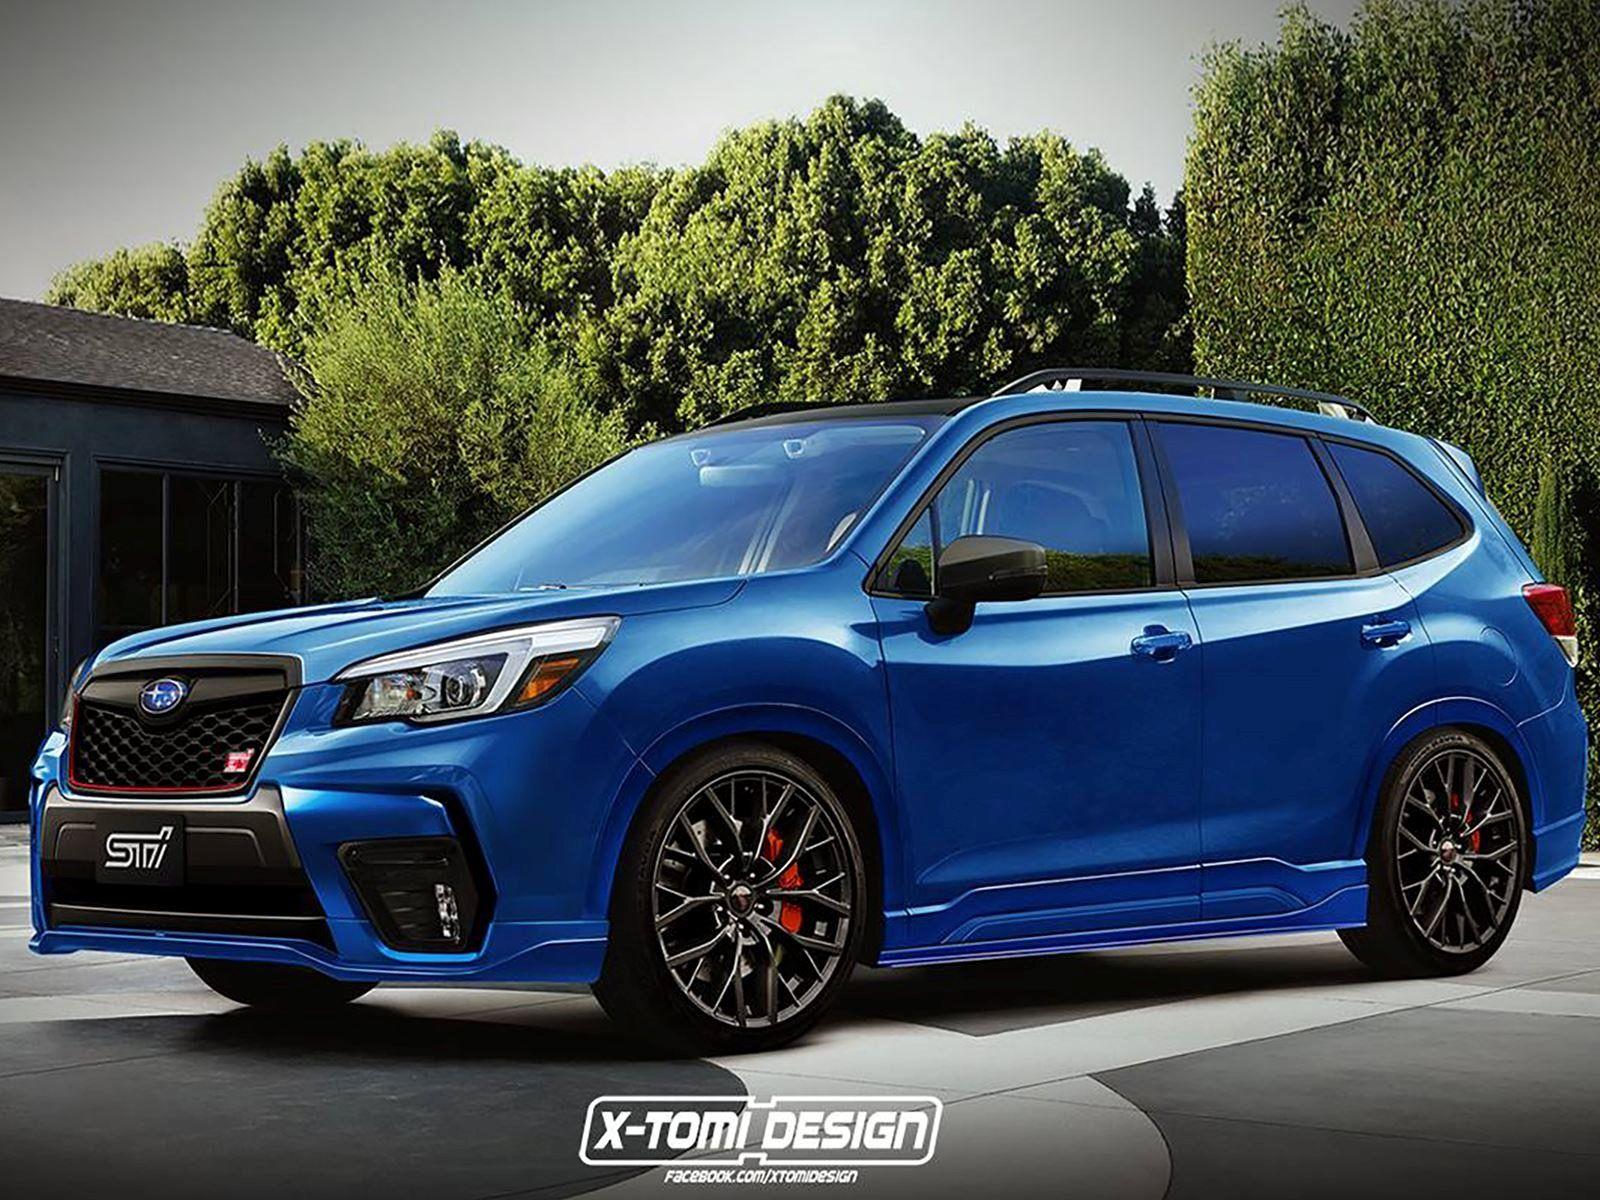 What If Subaru Made A HighPerformance Forester STI